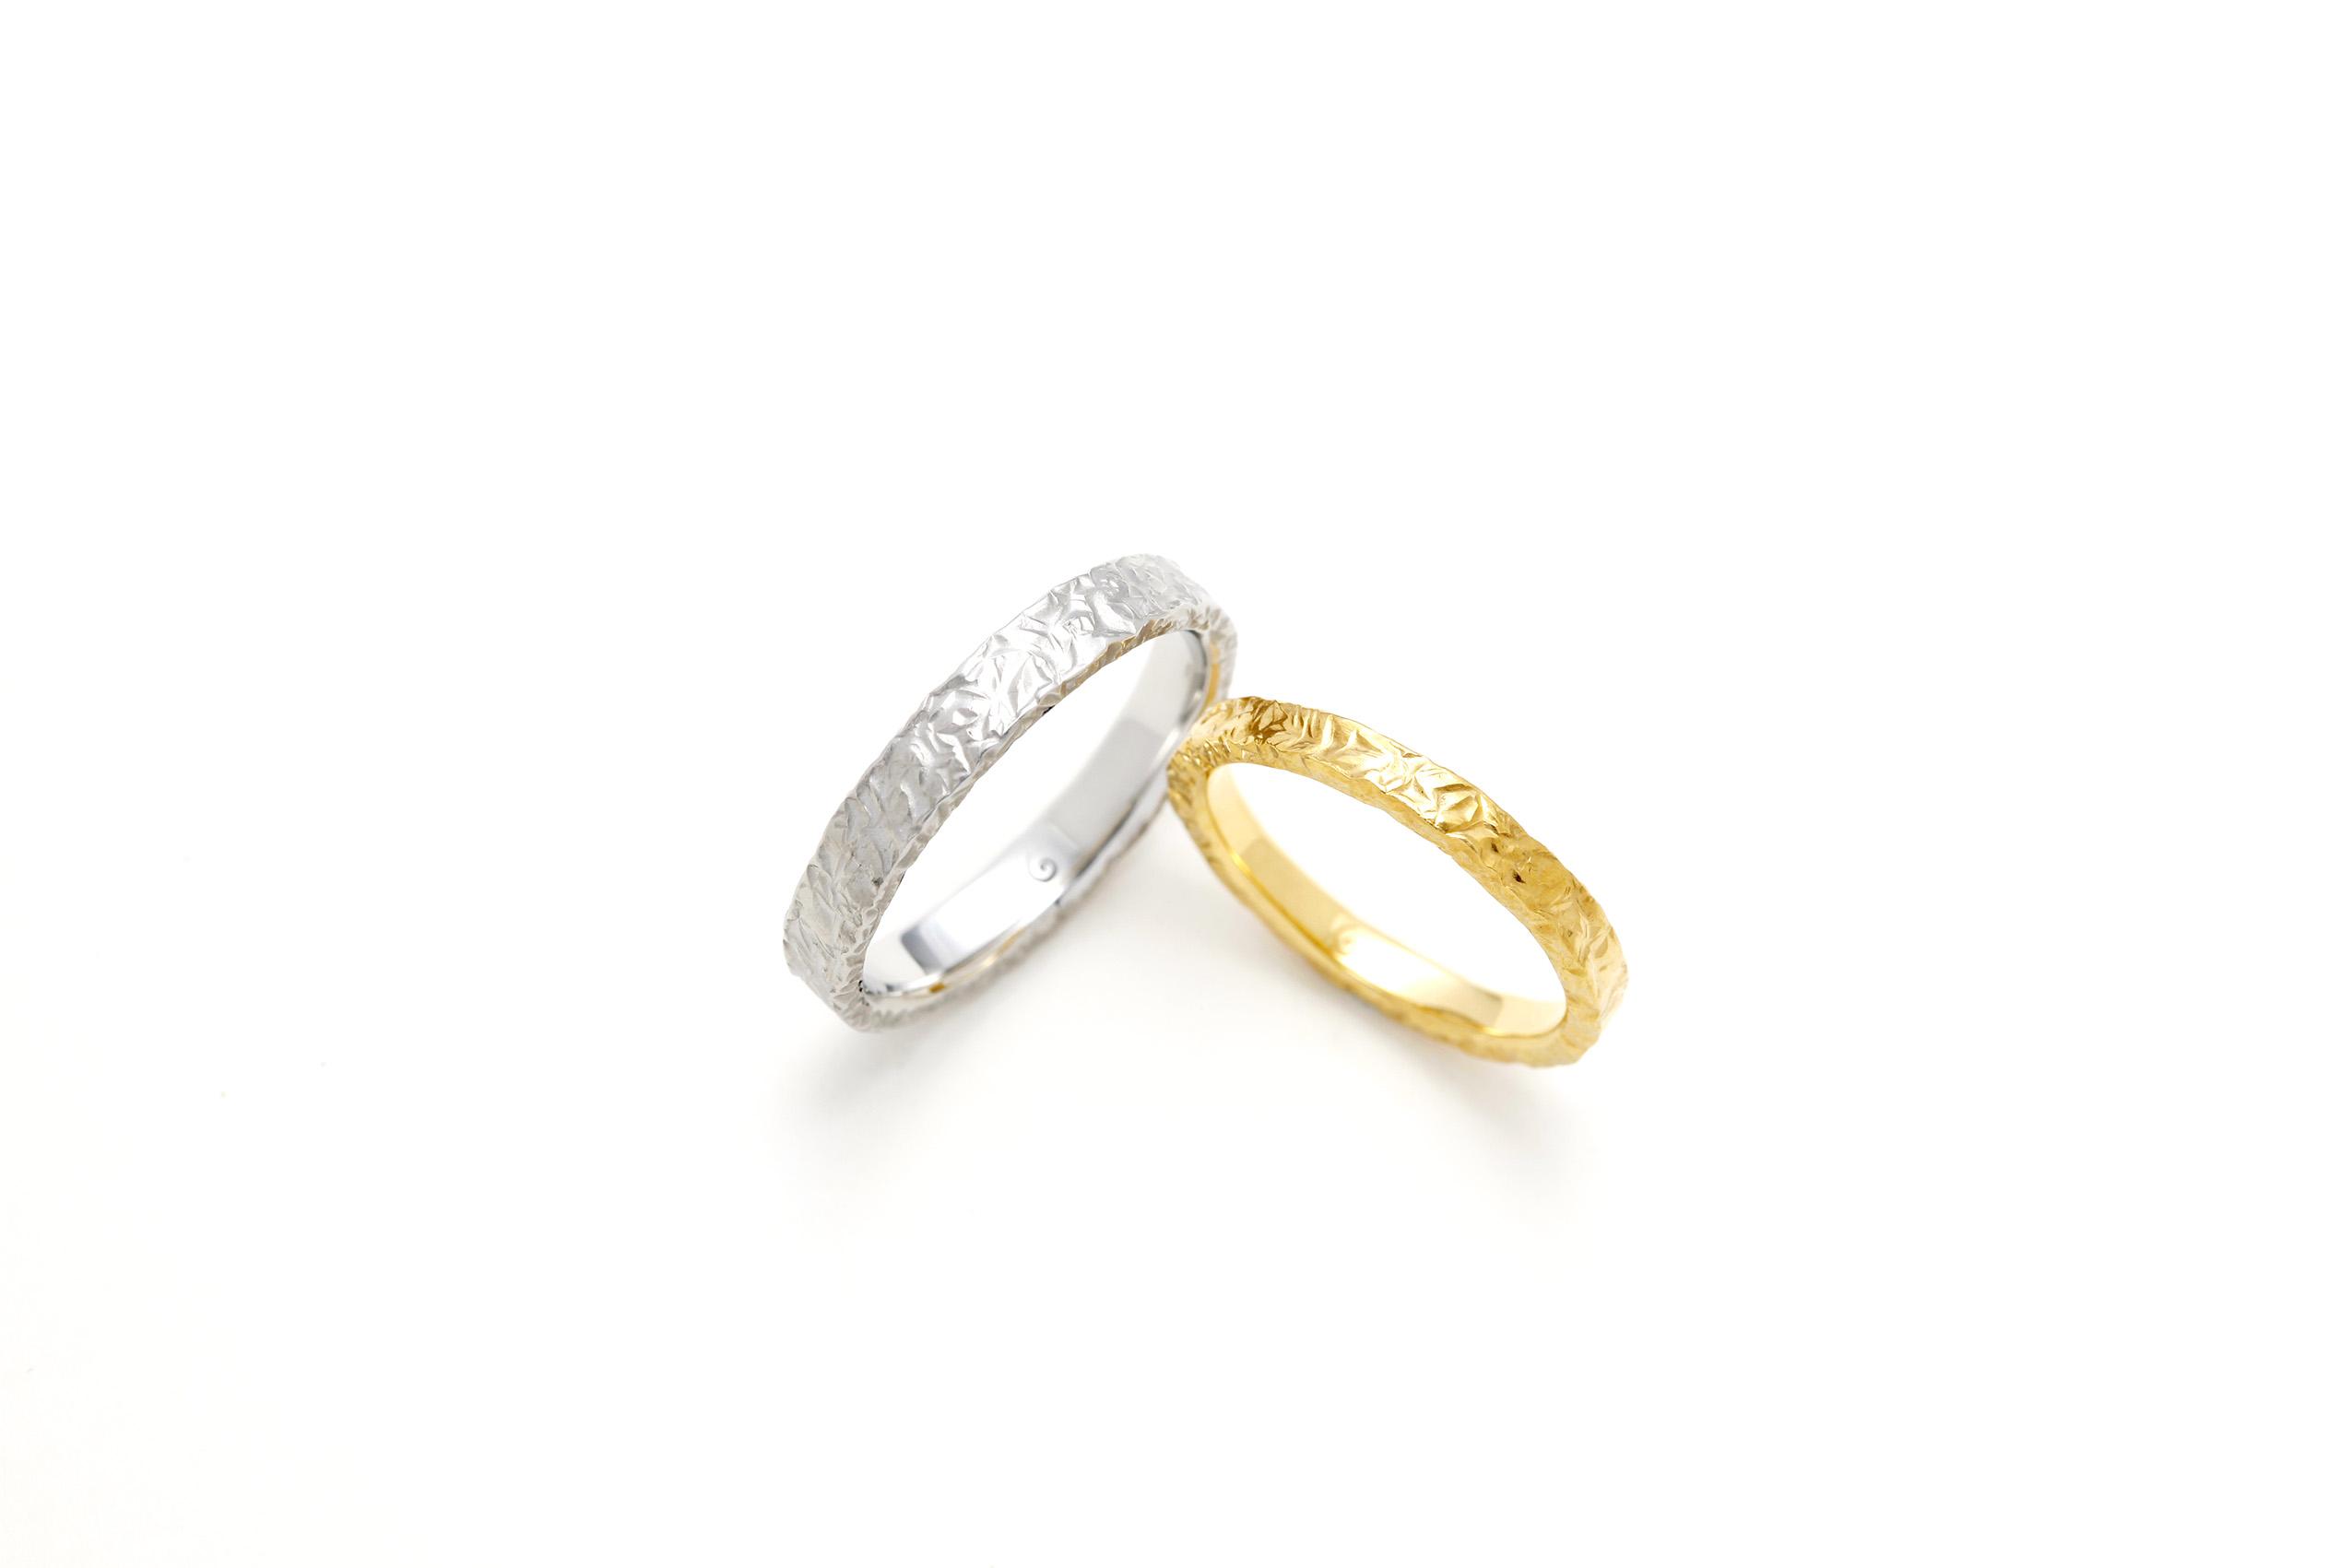 SORAの槌目の結婚指輪「チューリング」